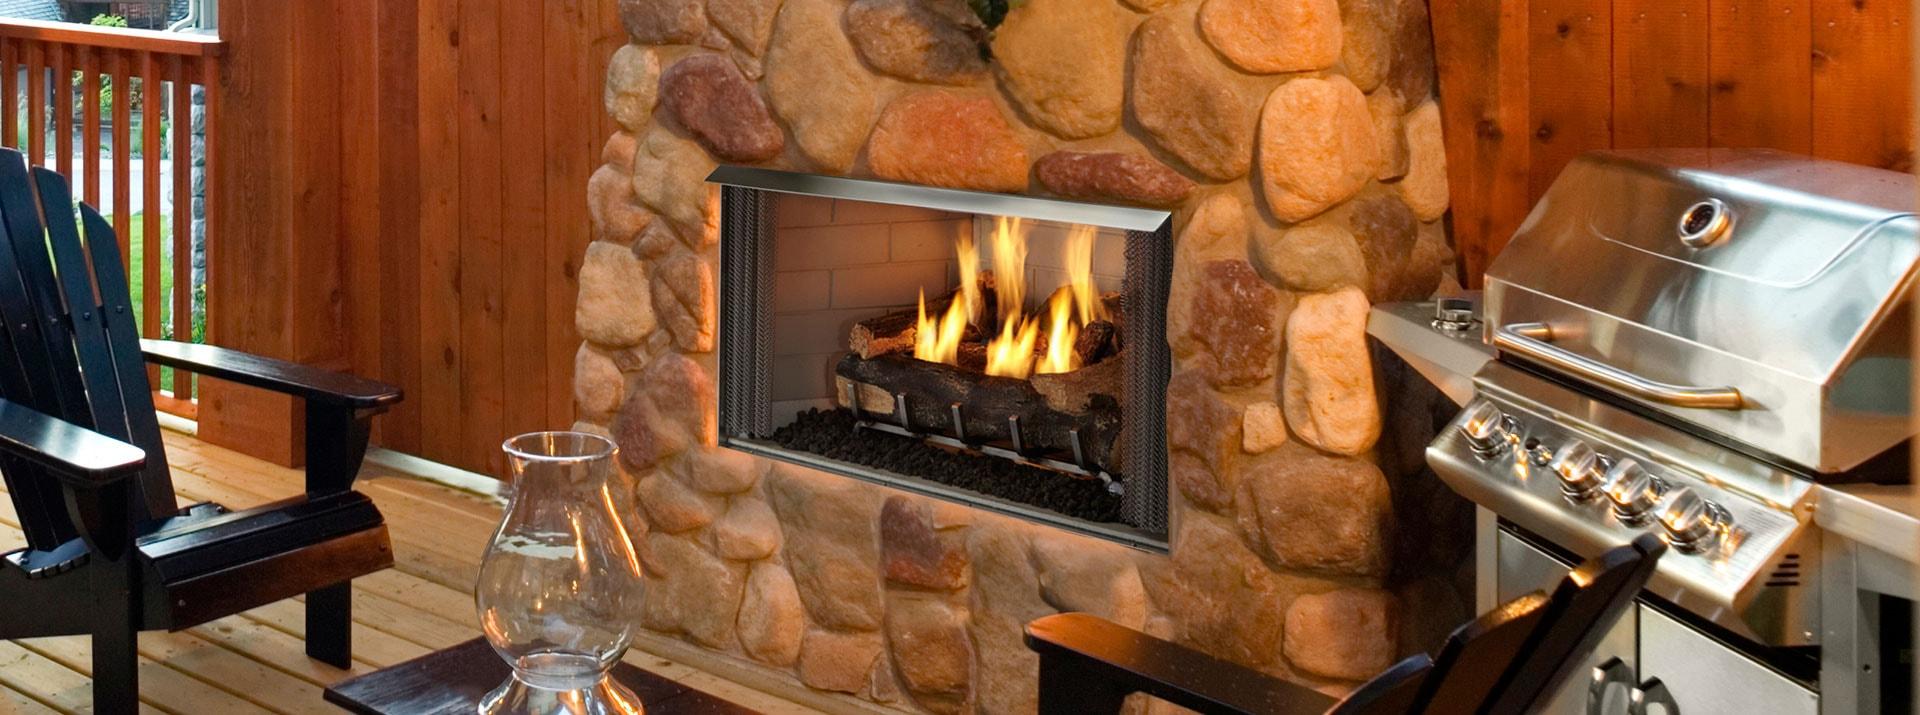 Villa Gas Fireplace